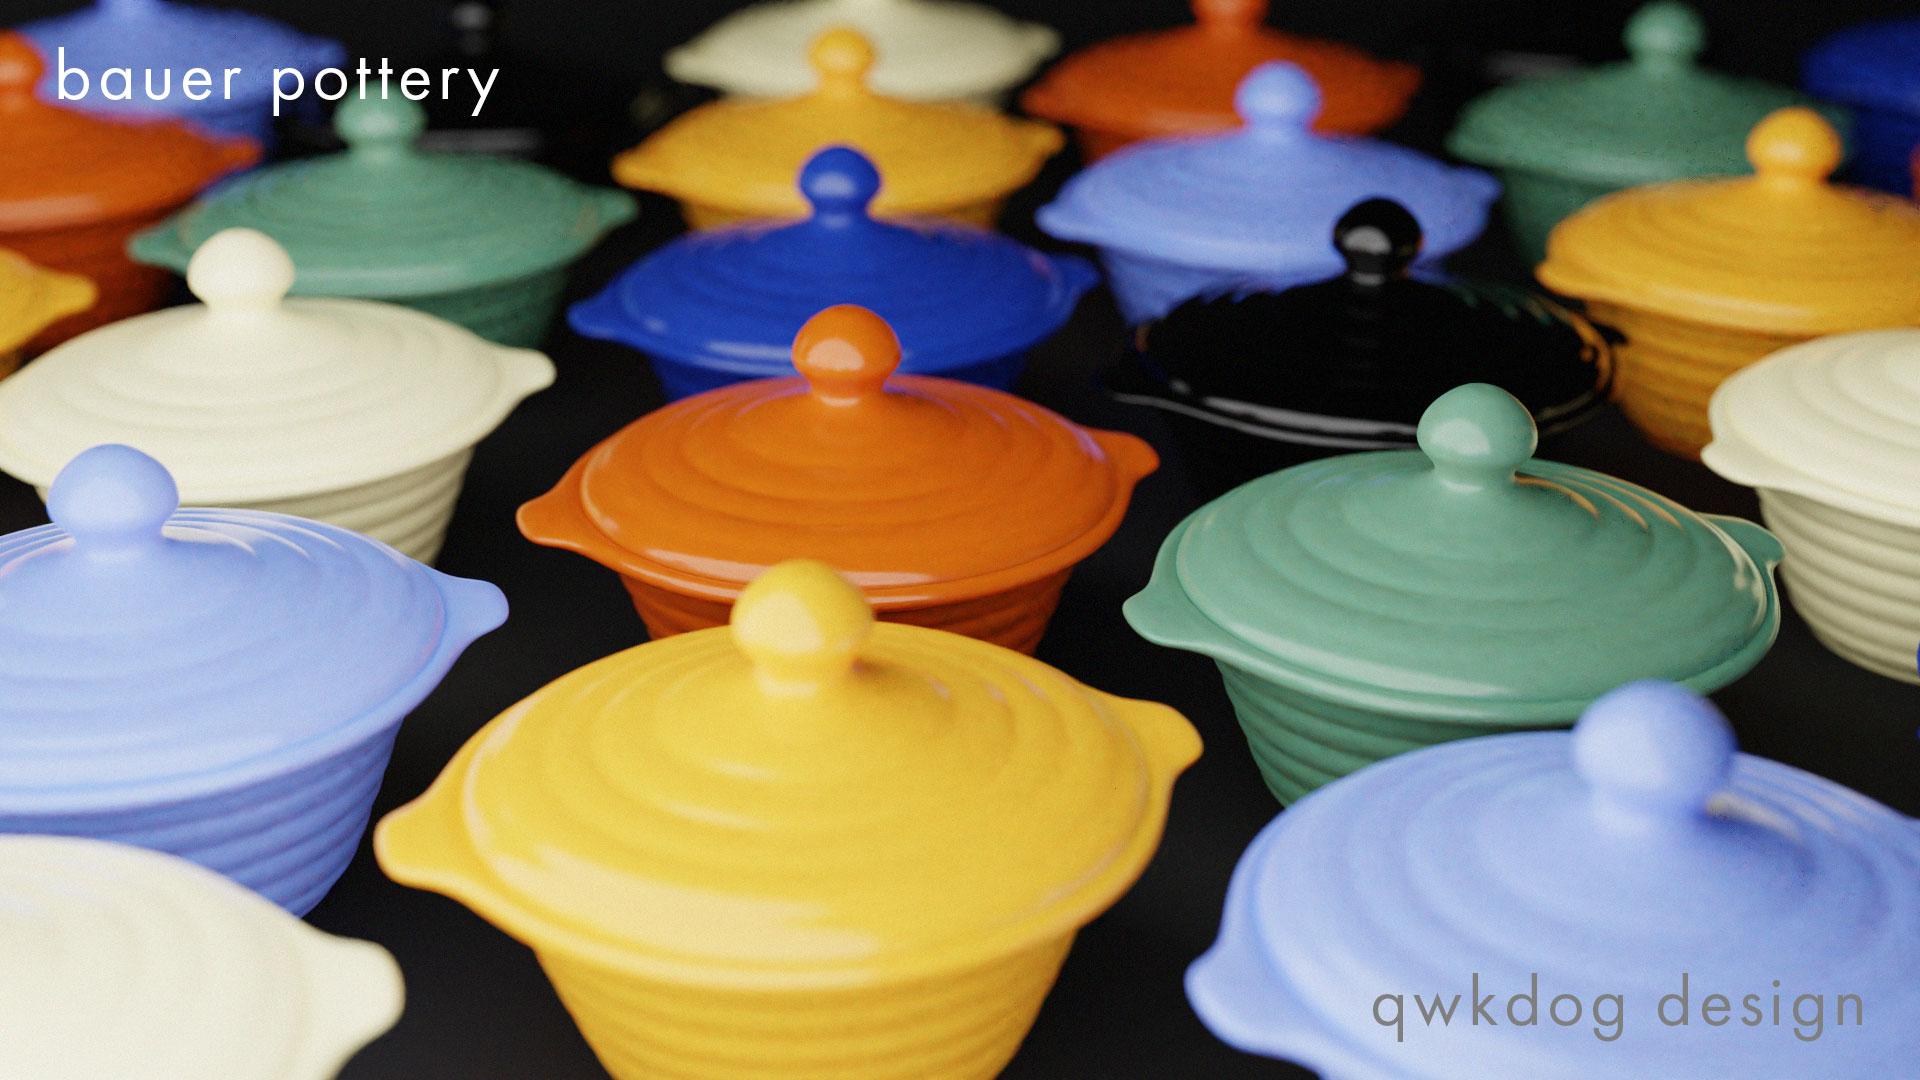 QwkDog Bauer Pottery Ramekins Dark